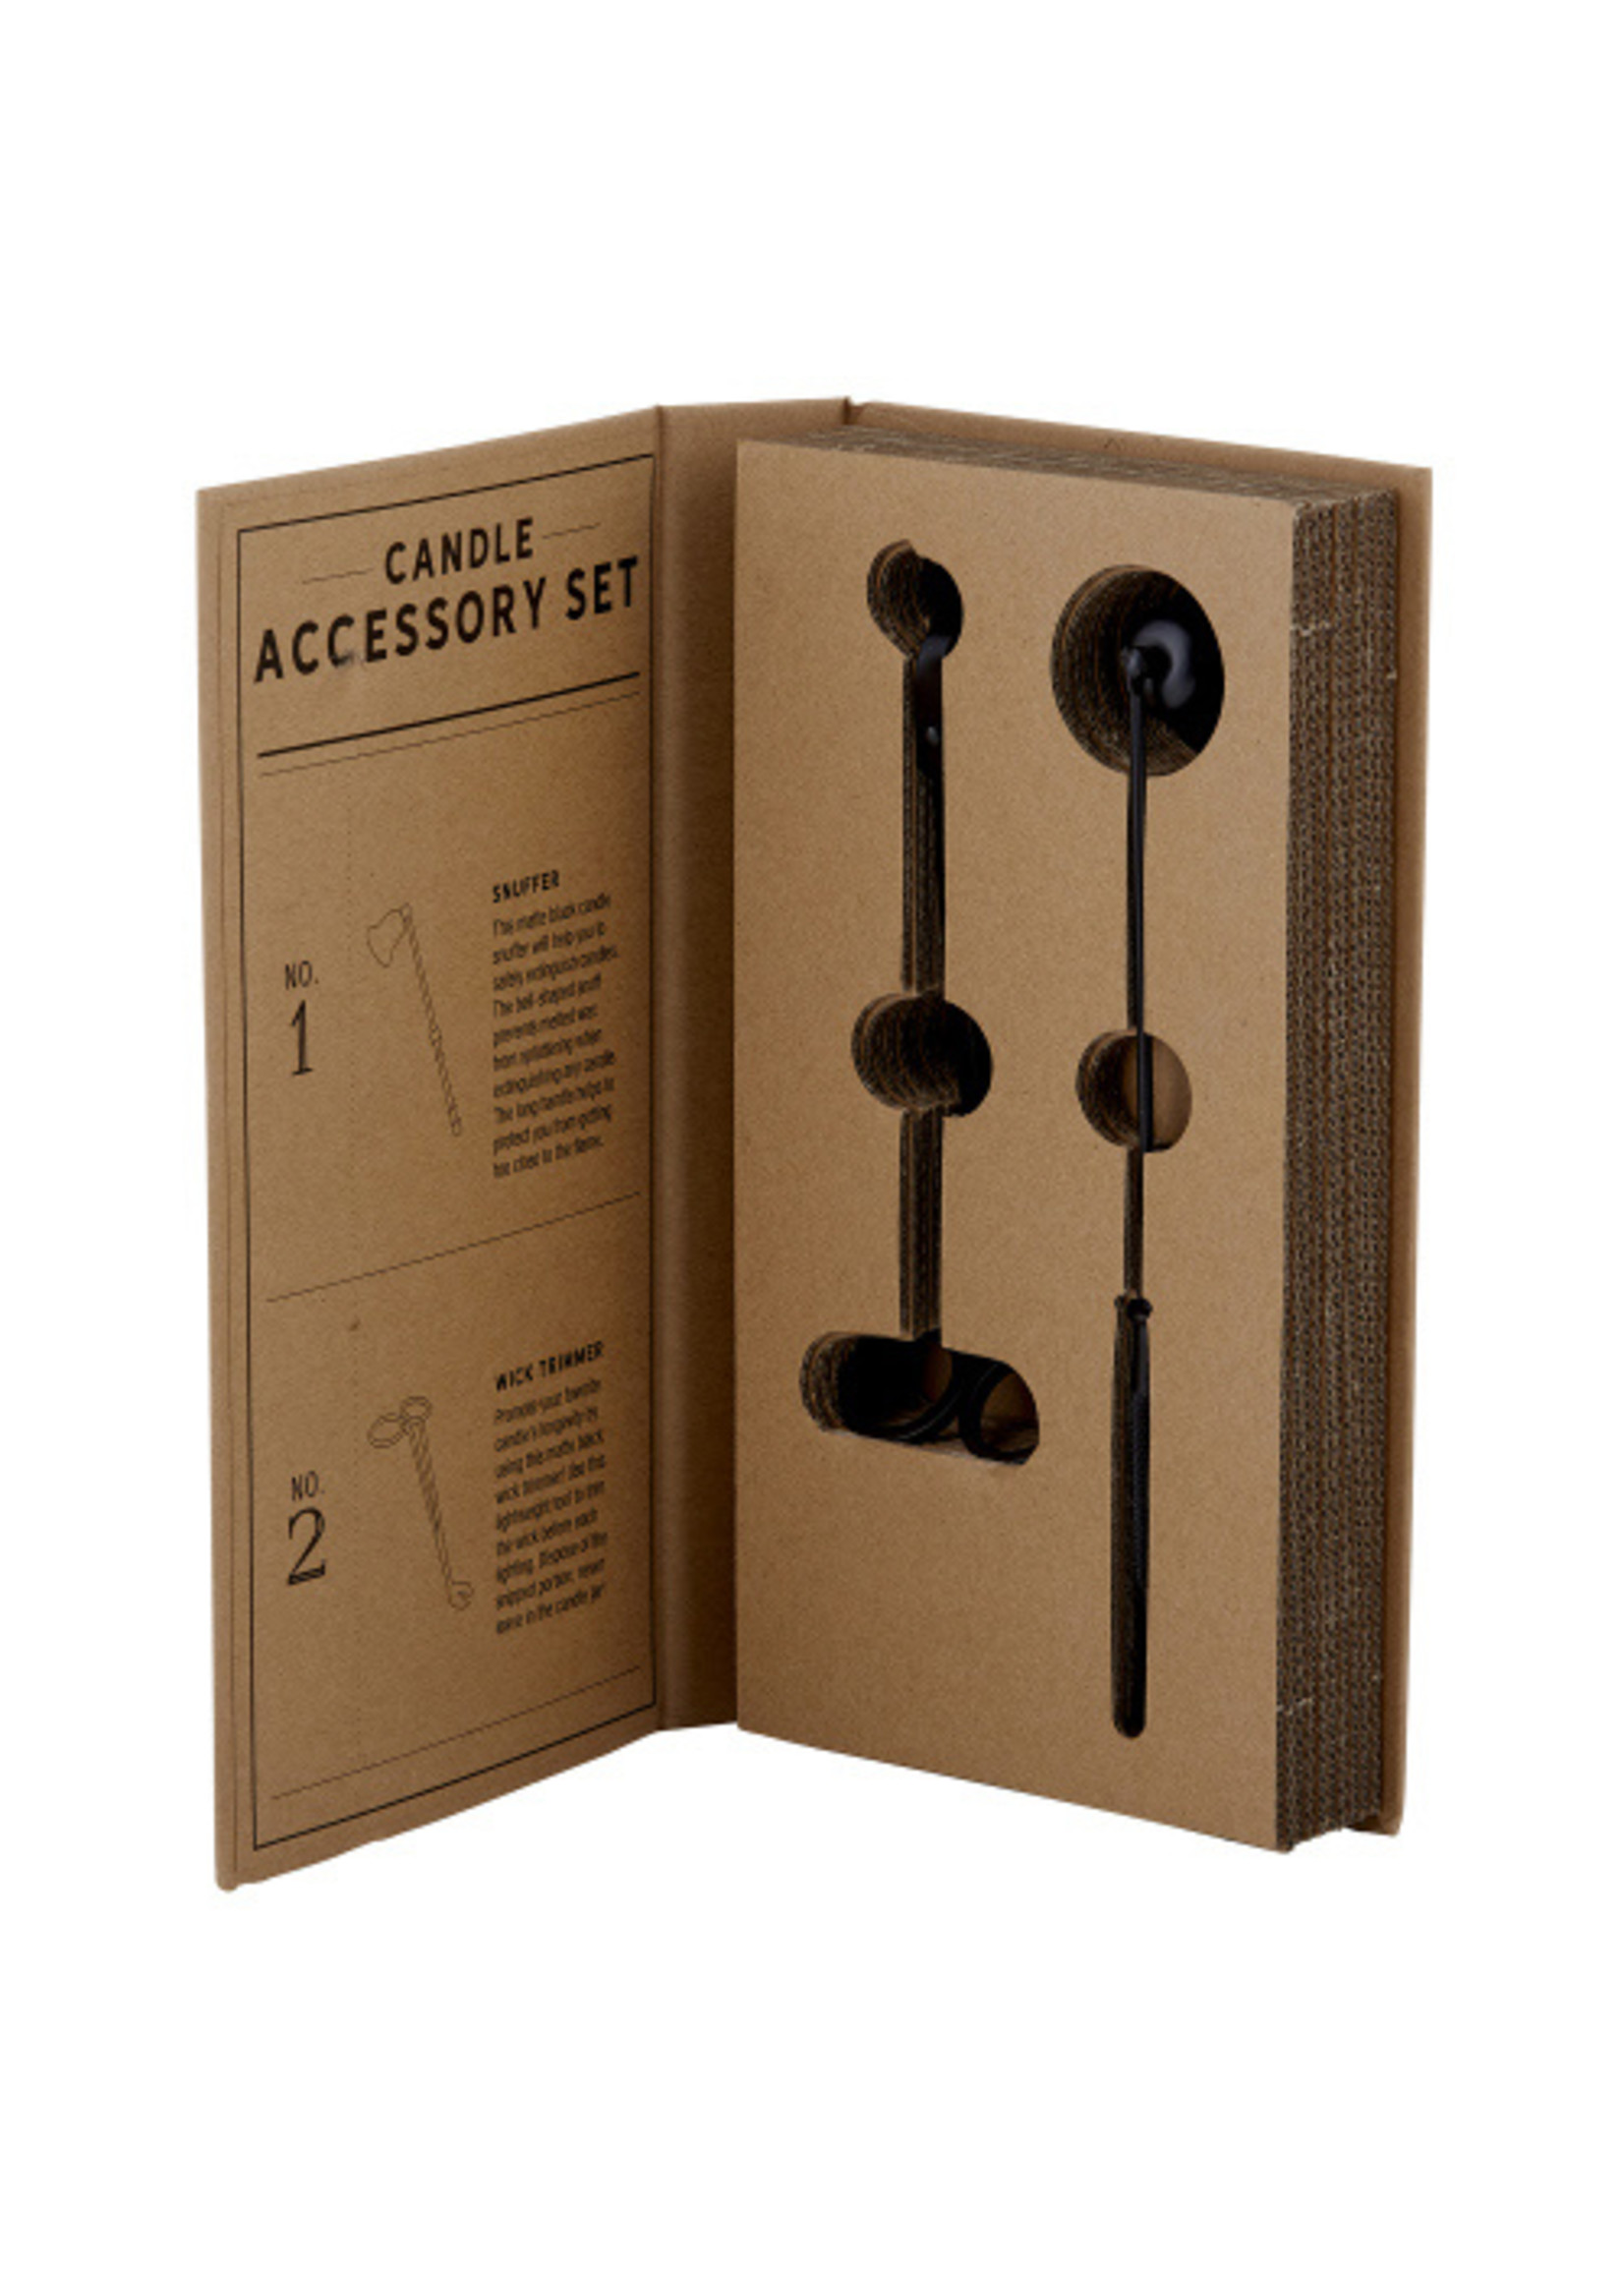 Candle Accessory Set